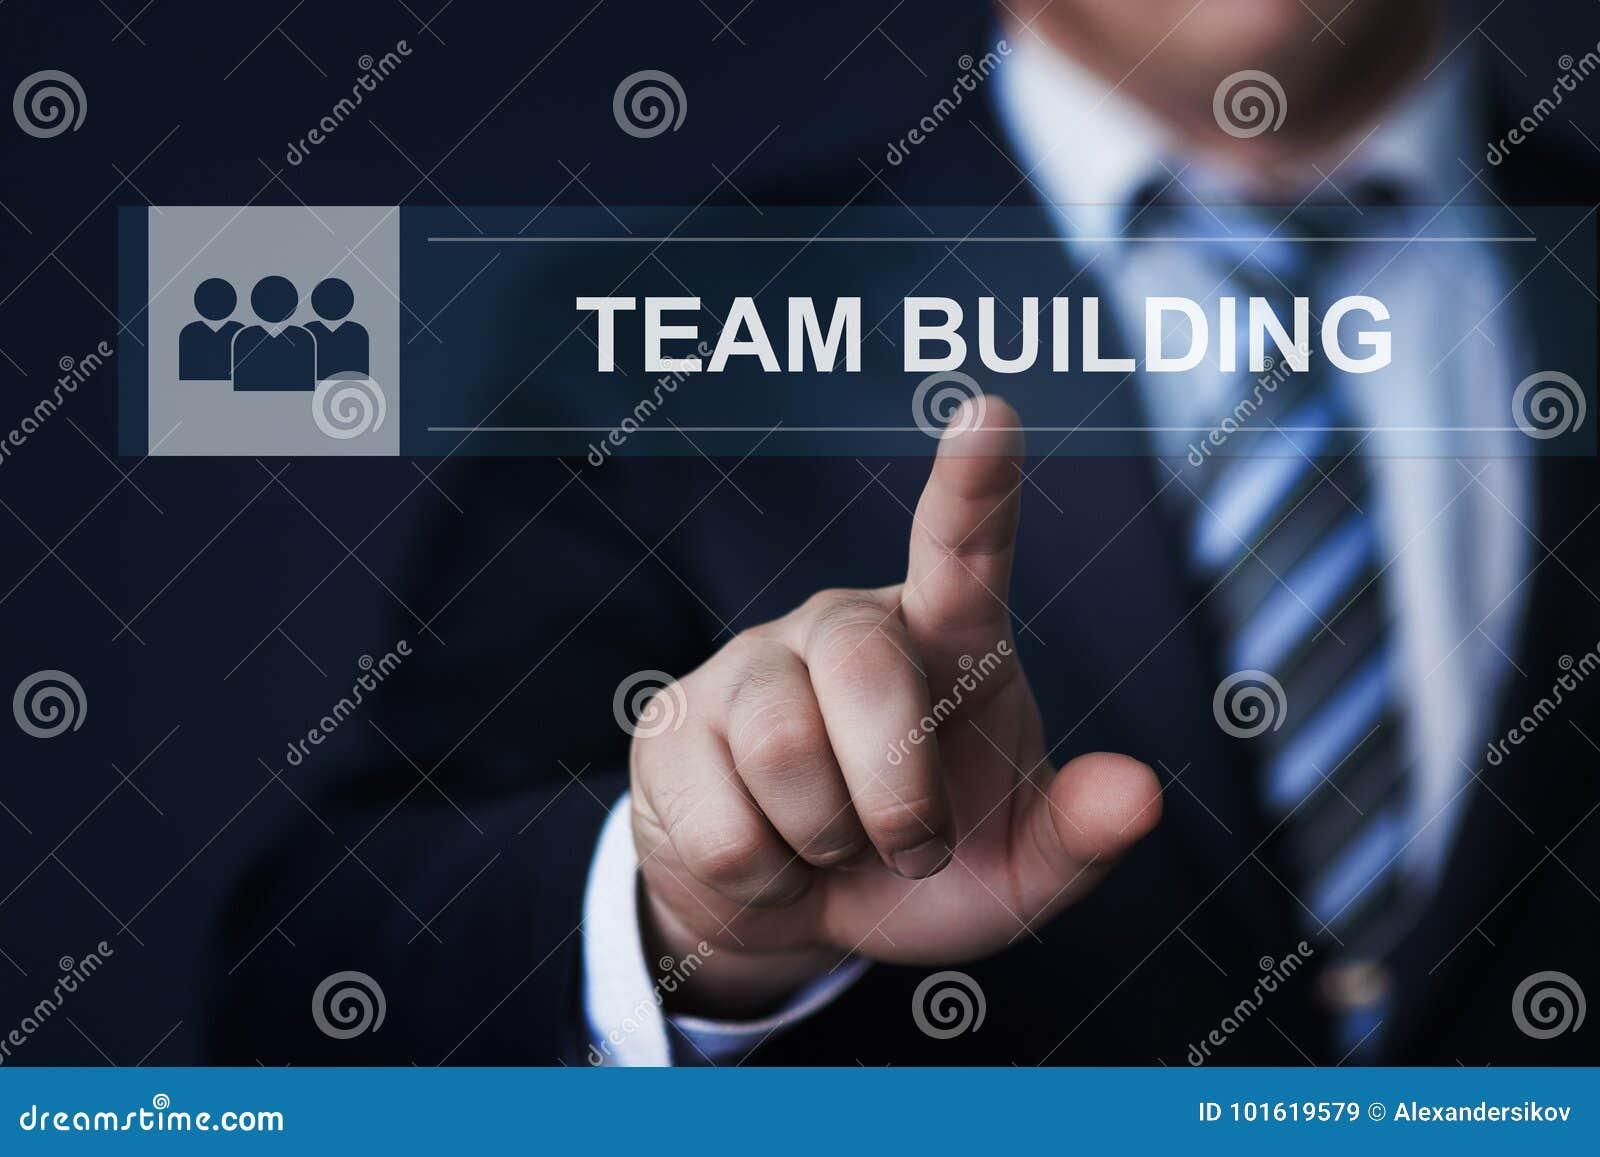 Teamwork Team building Successs Partnership Cooperation Business Technology Internet Concept